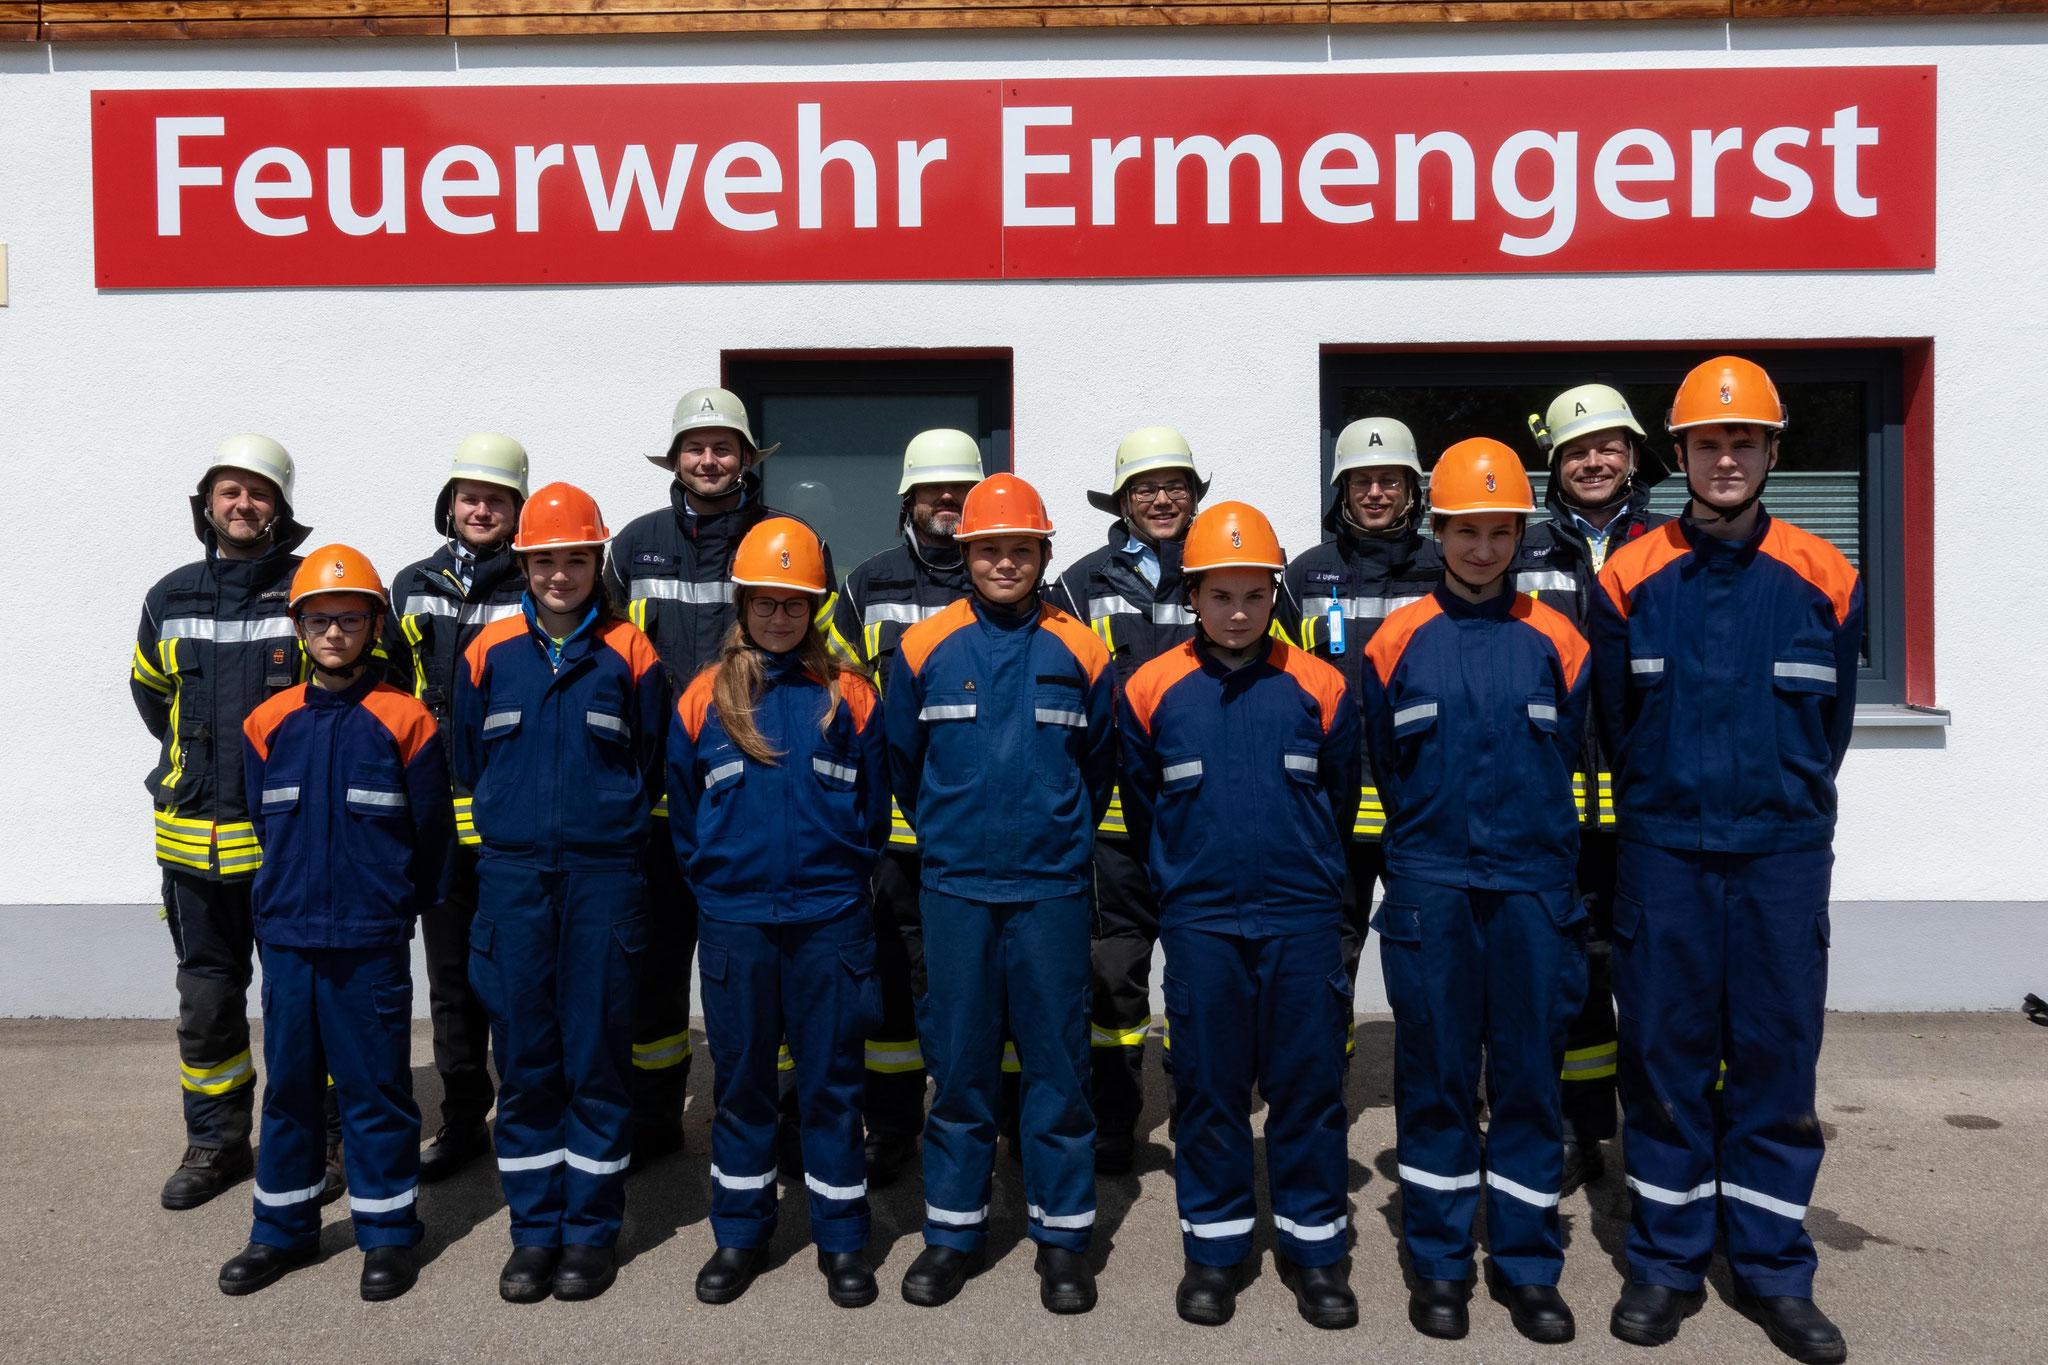 Freiwillige Feuerwehr Ermengerst -  Jugendgruppe